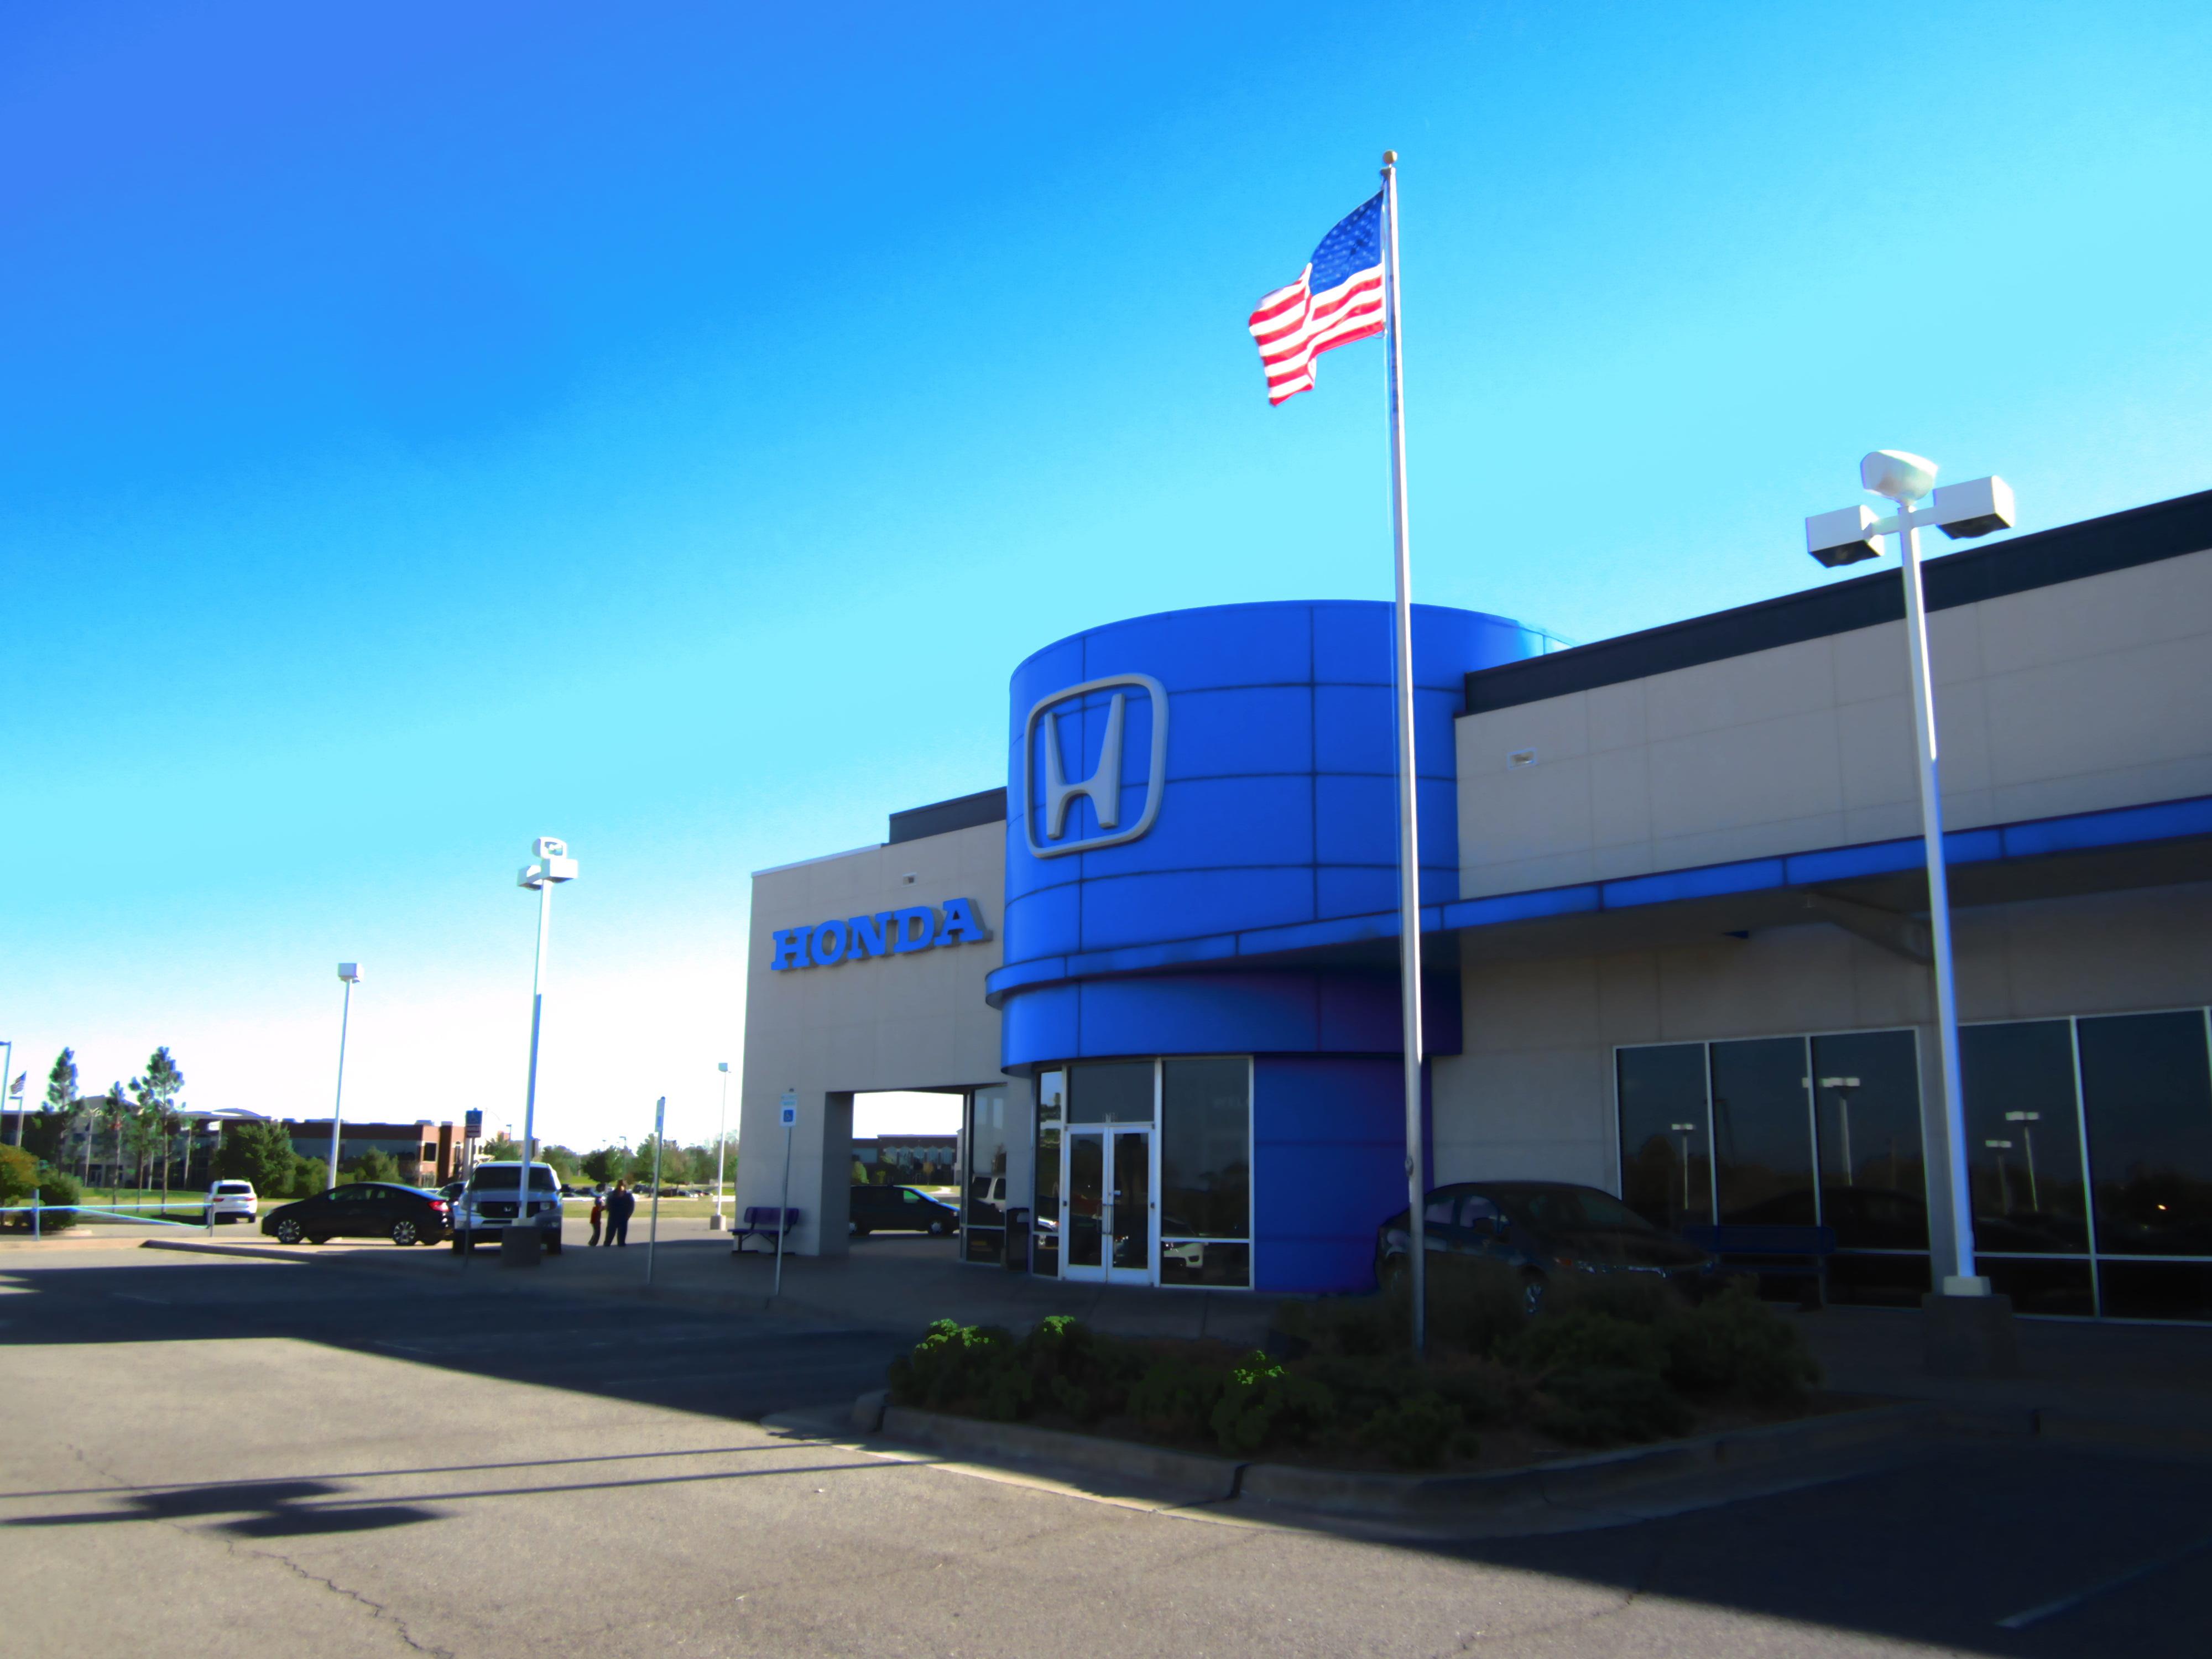 Battison honda 8700 nw expressway oklahoma city ok 73162 for Honda dealers okc